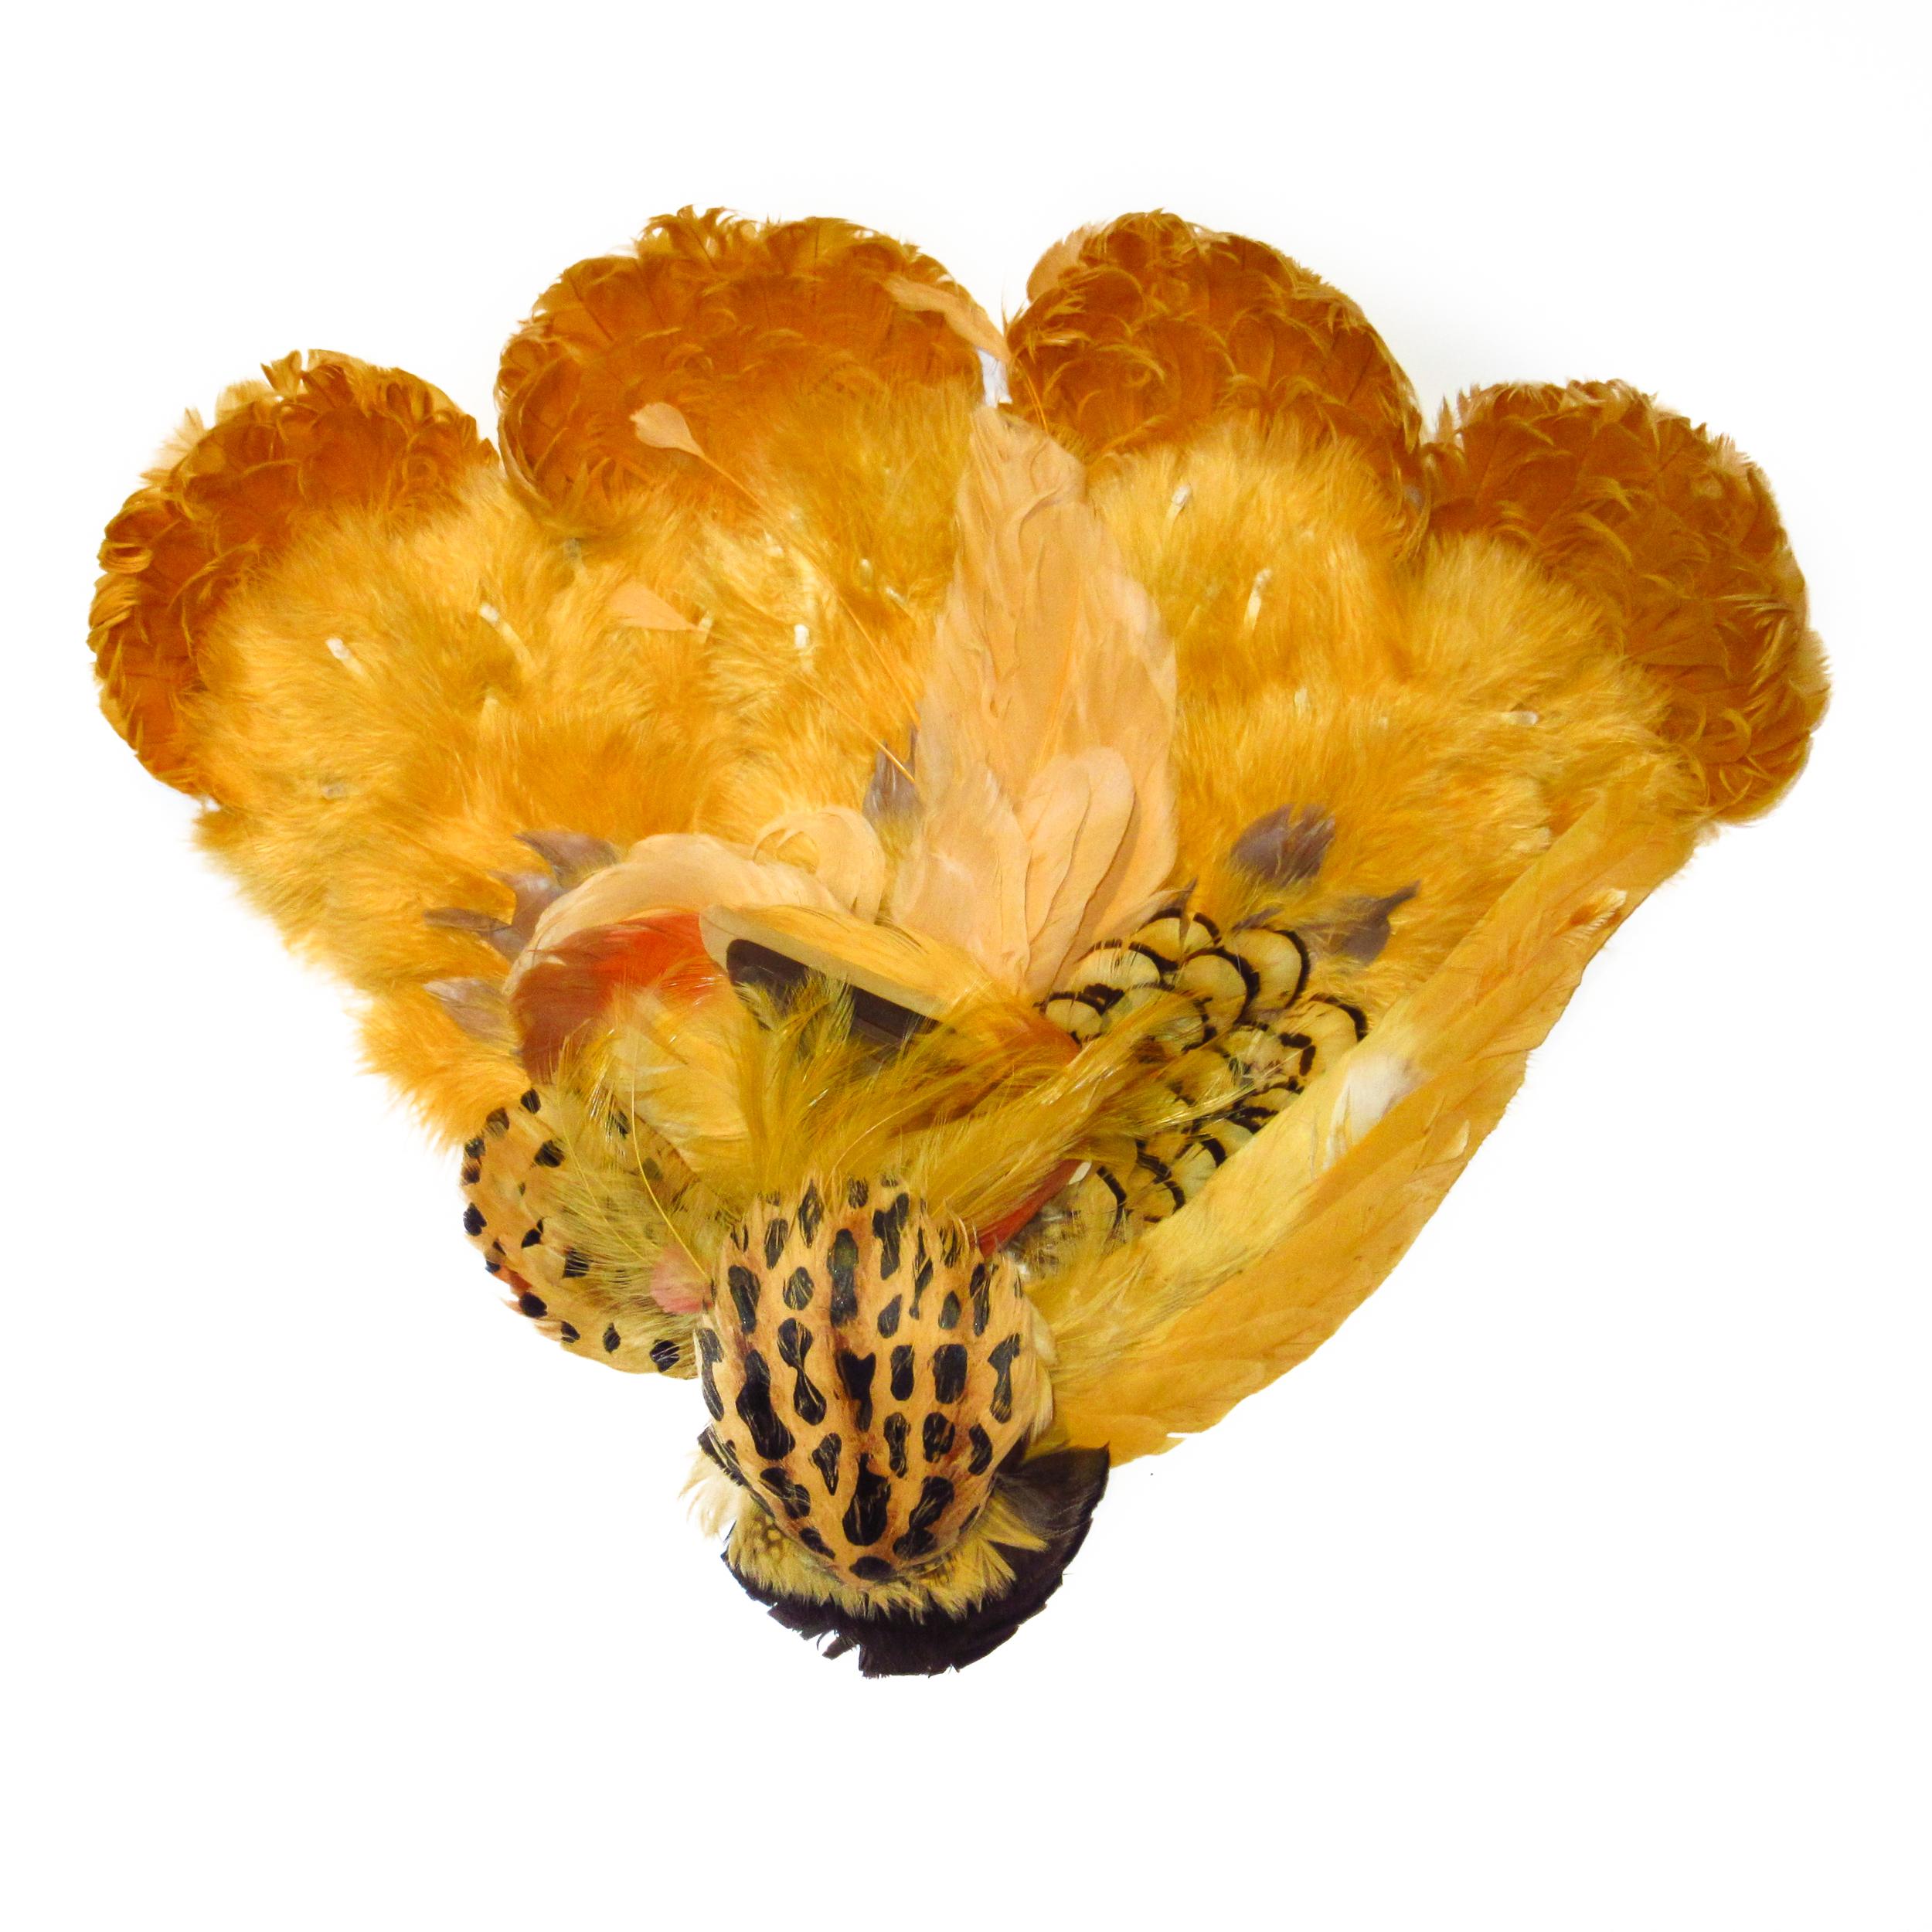 Yellow orange feathers